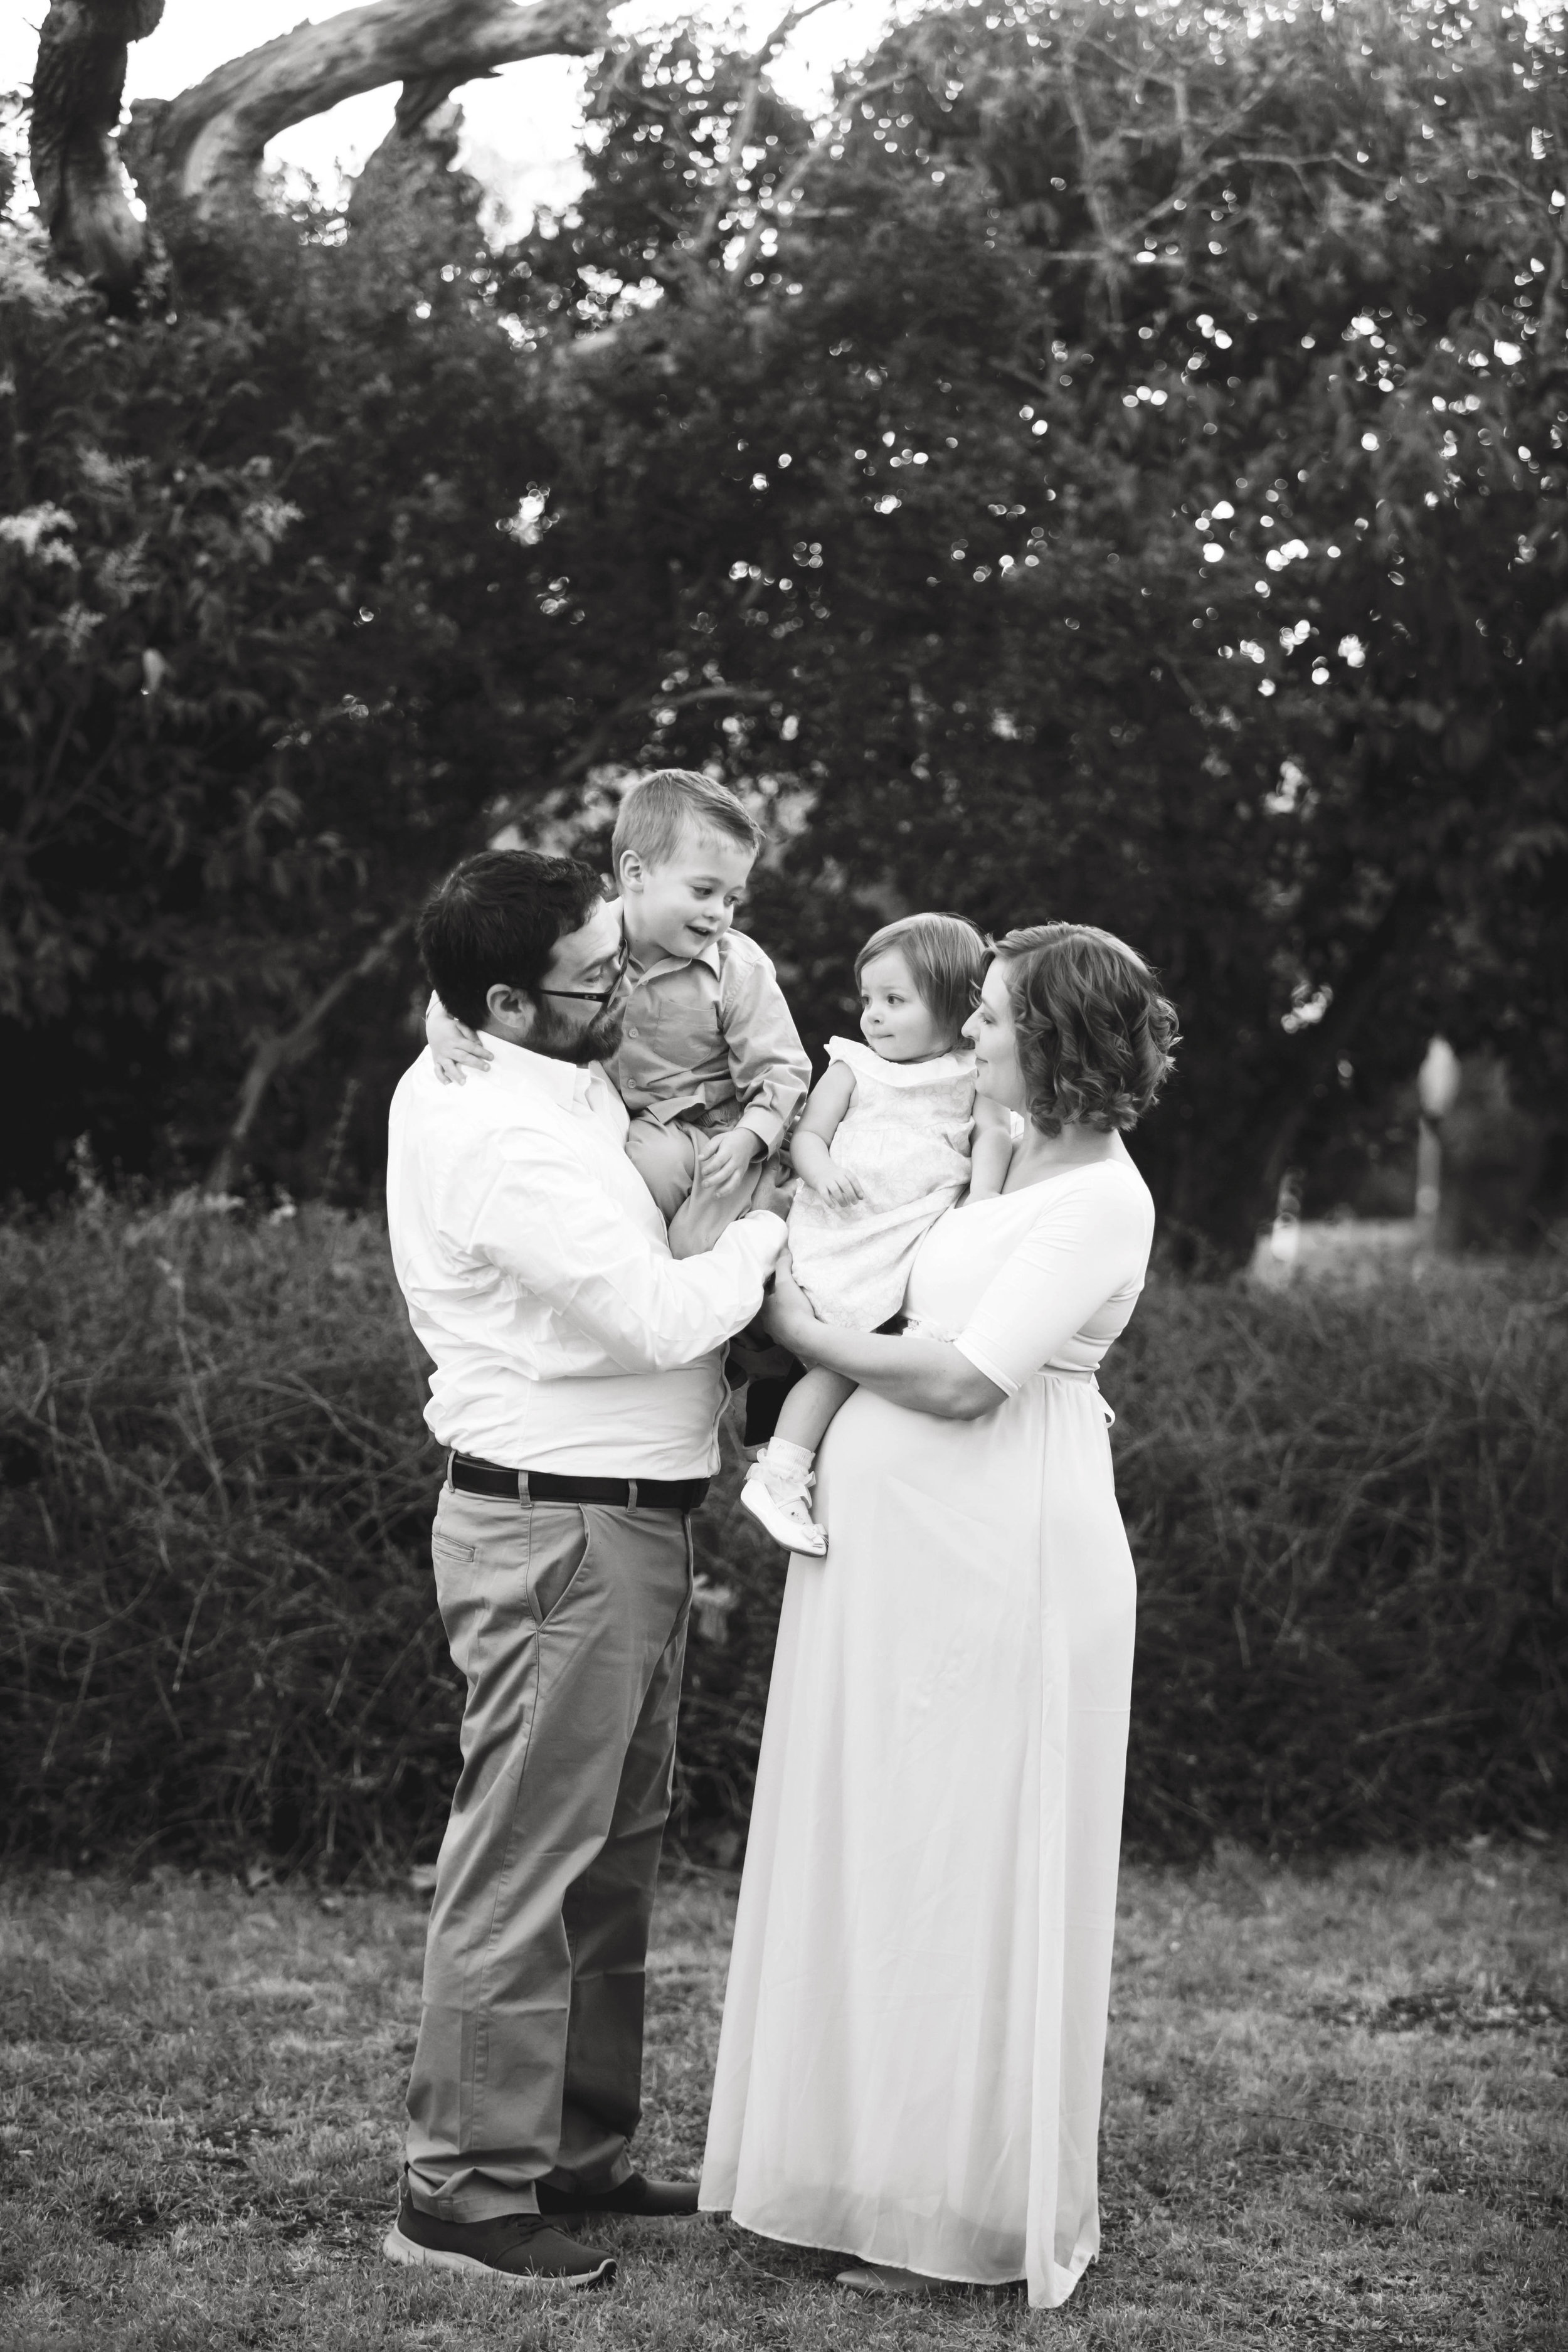 Marble_Falls_Leger_Family_Photographer_Jenna_Petty_16.jpg